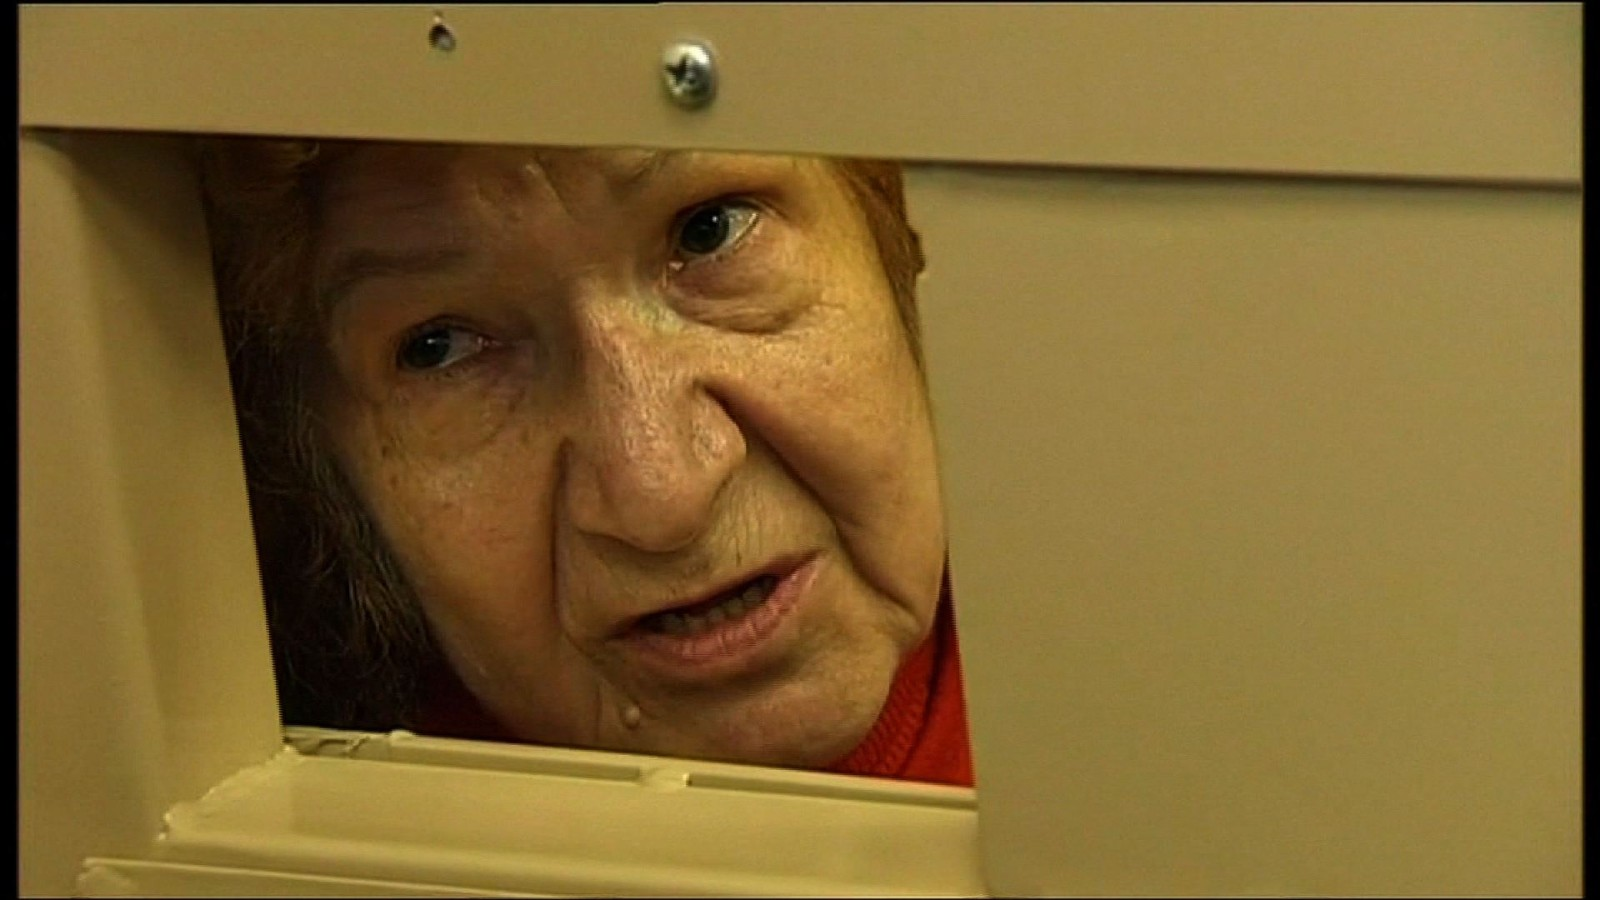 Huyền Thoại Kẻ sát nhân Katherine Mary Knight (hay Australia's Hanna Lecter)